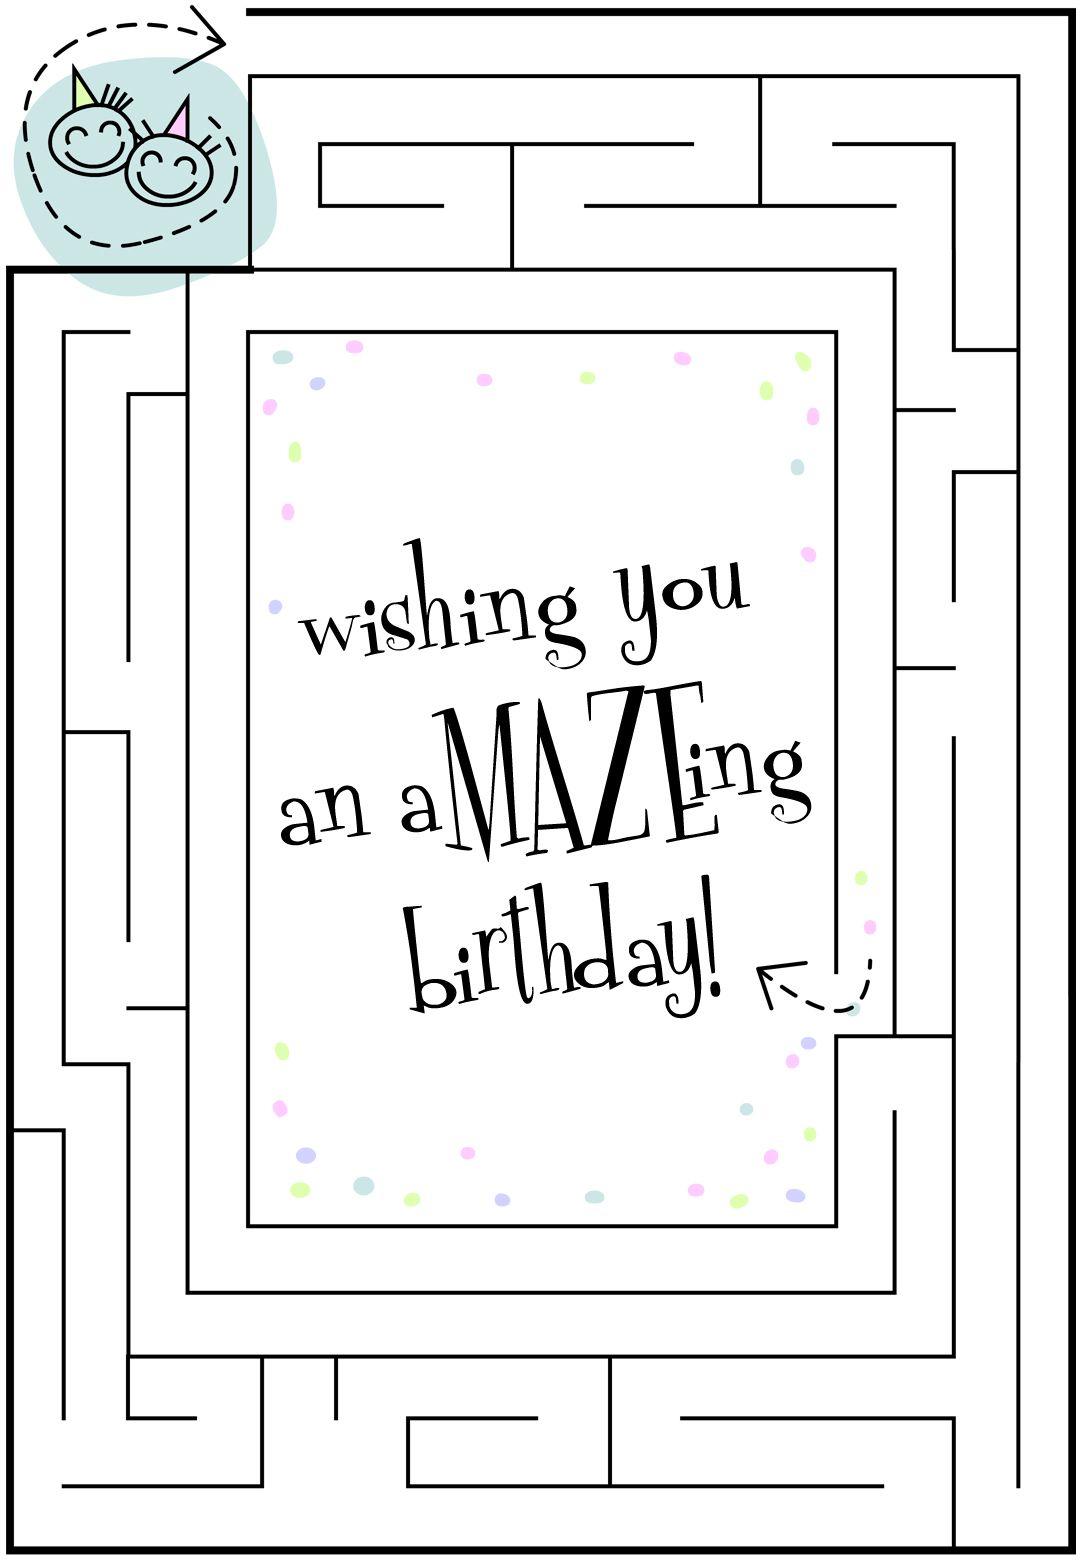 Birthday Card Wishing You An Amazing Birthday